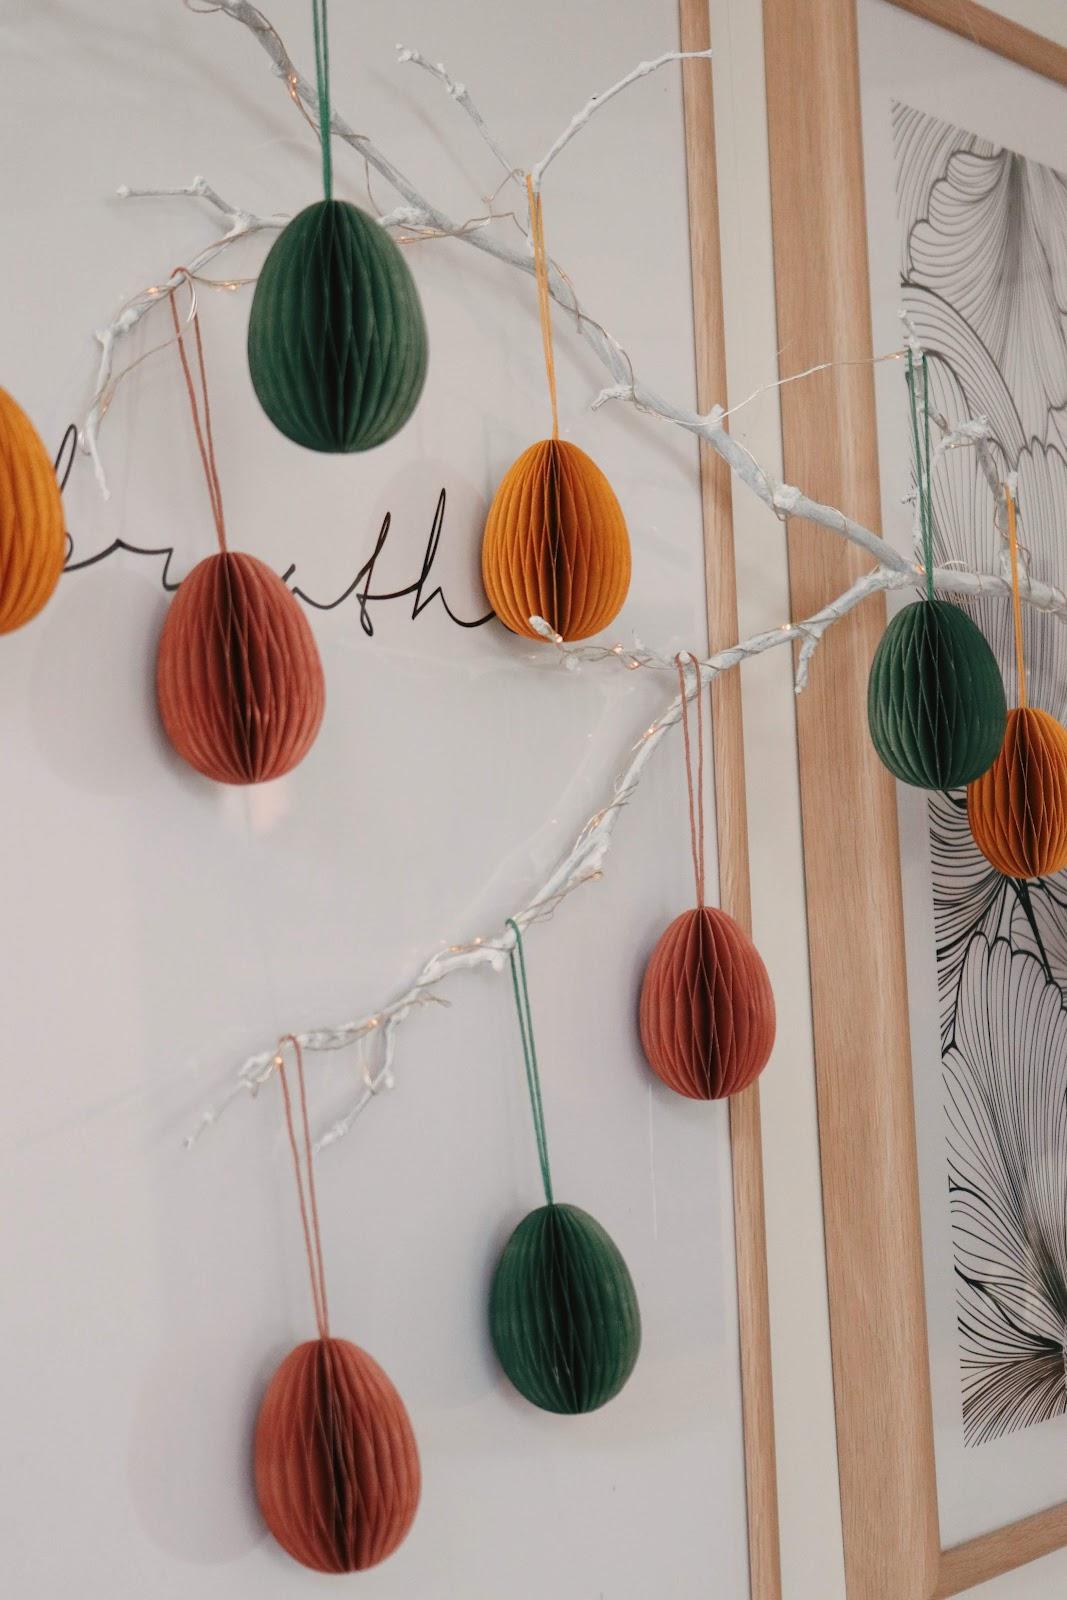 Skandi Style Easter Decorations